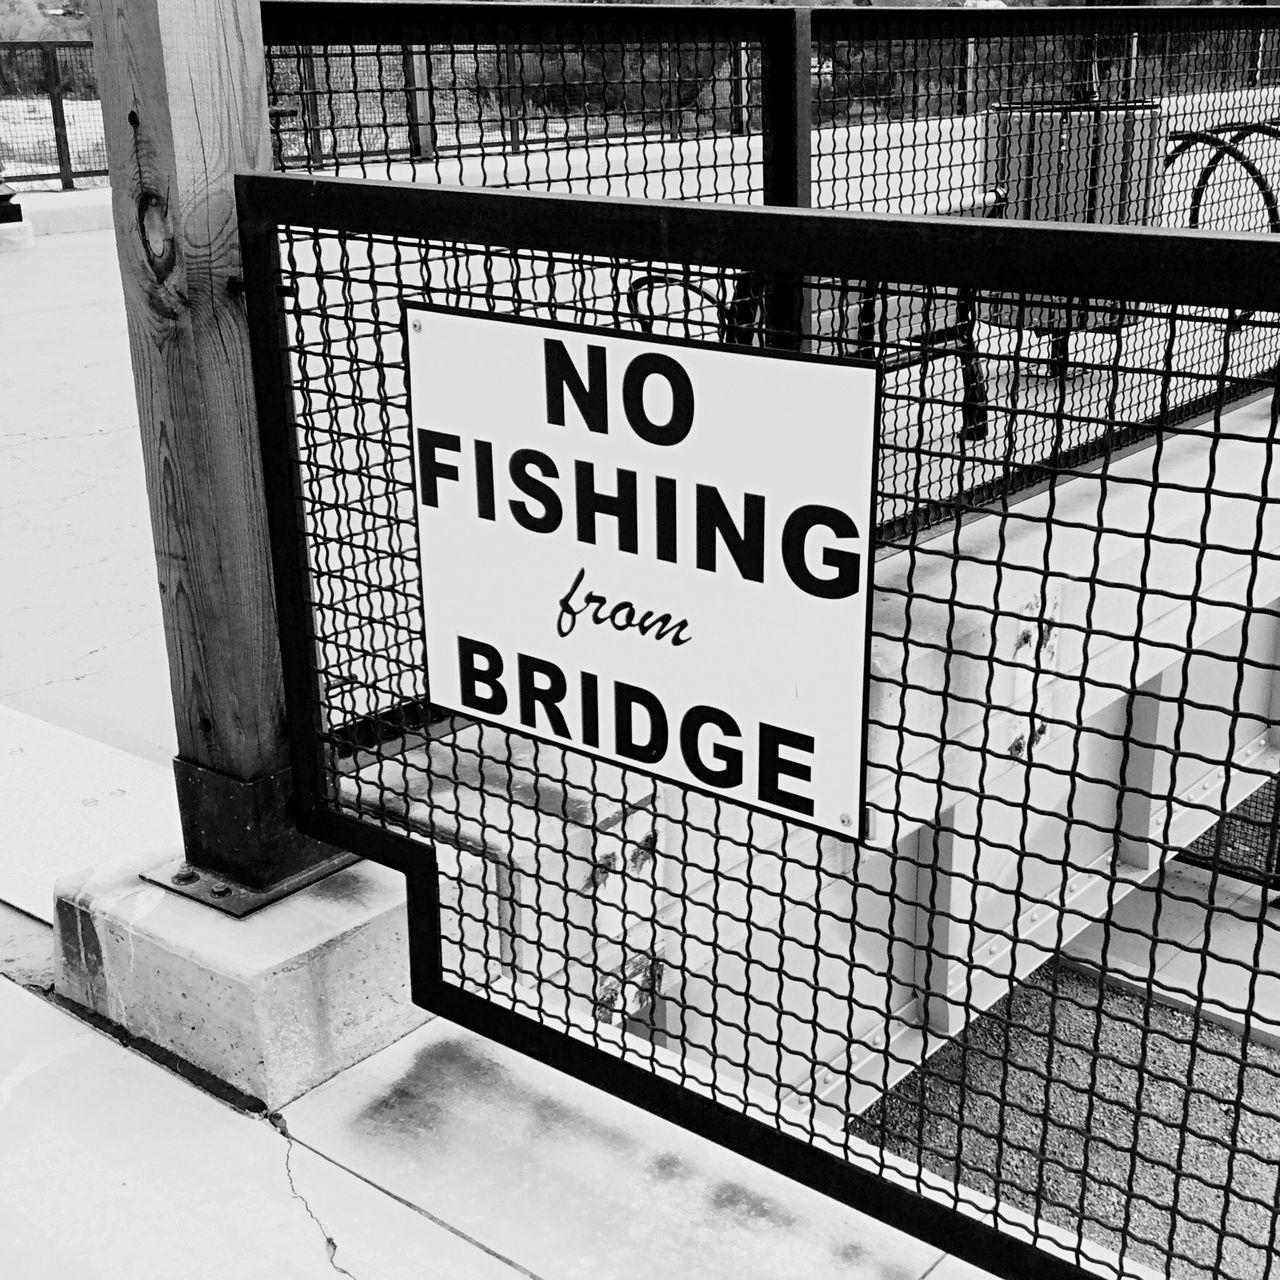 Arizona Wickenburg Desert Sign Bridge No Fishing Beautiful Rustic Historic Way Out West Black & White Hidden Gems  Scenic